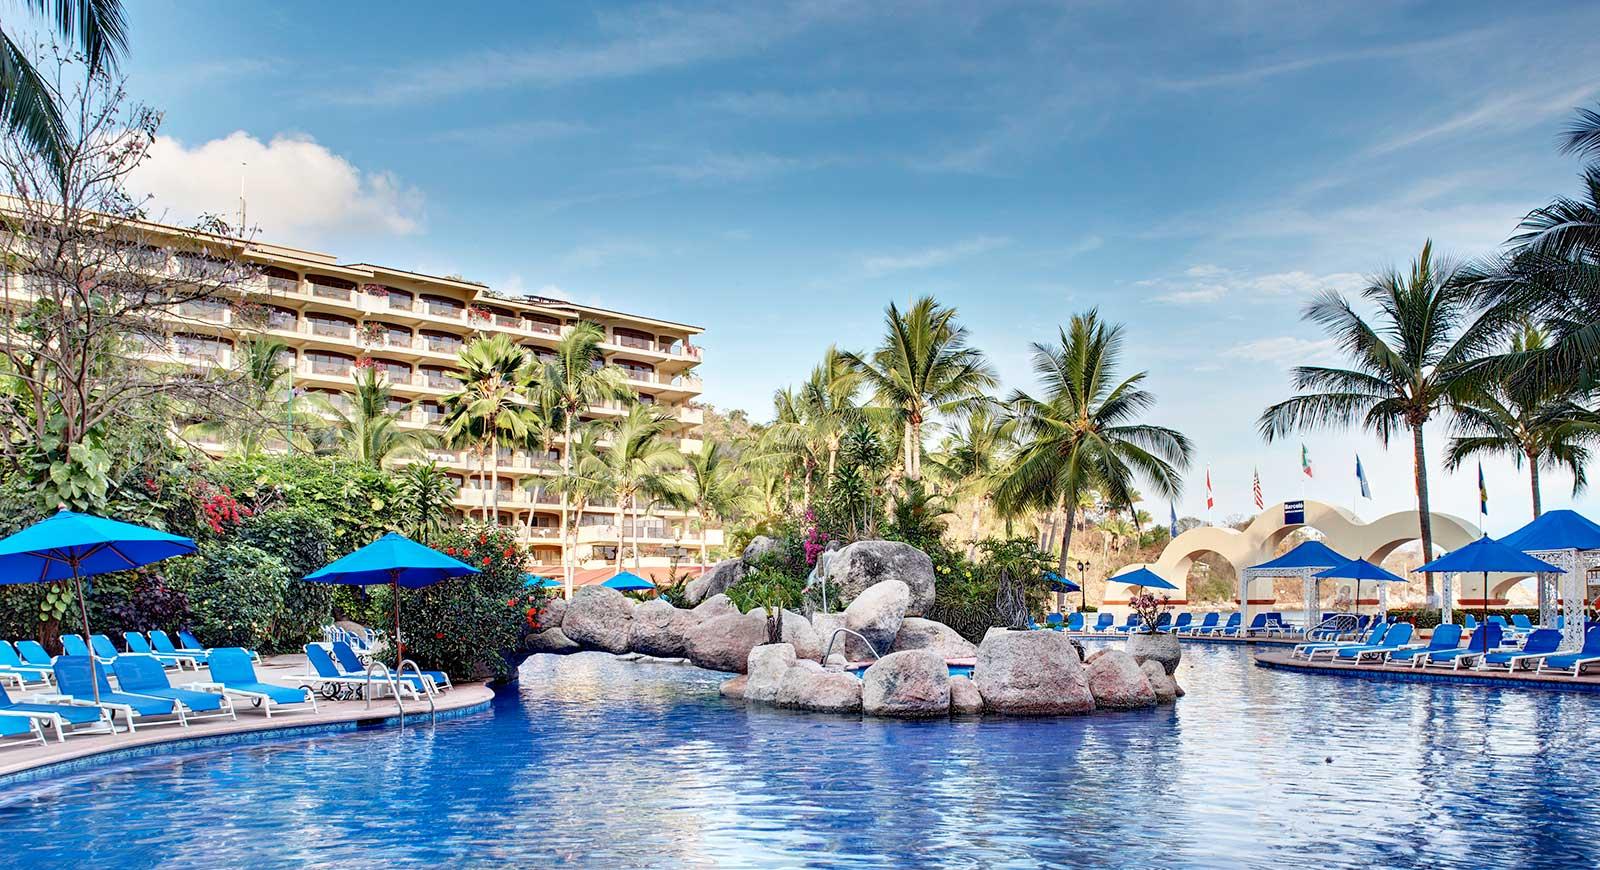 252-swimming-pool-4-hotel-barcelo-puerto-vallarta_tcm21-32117.jpg